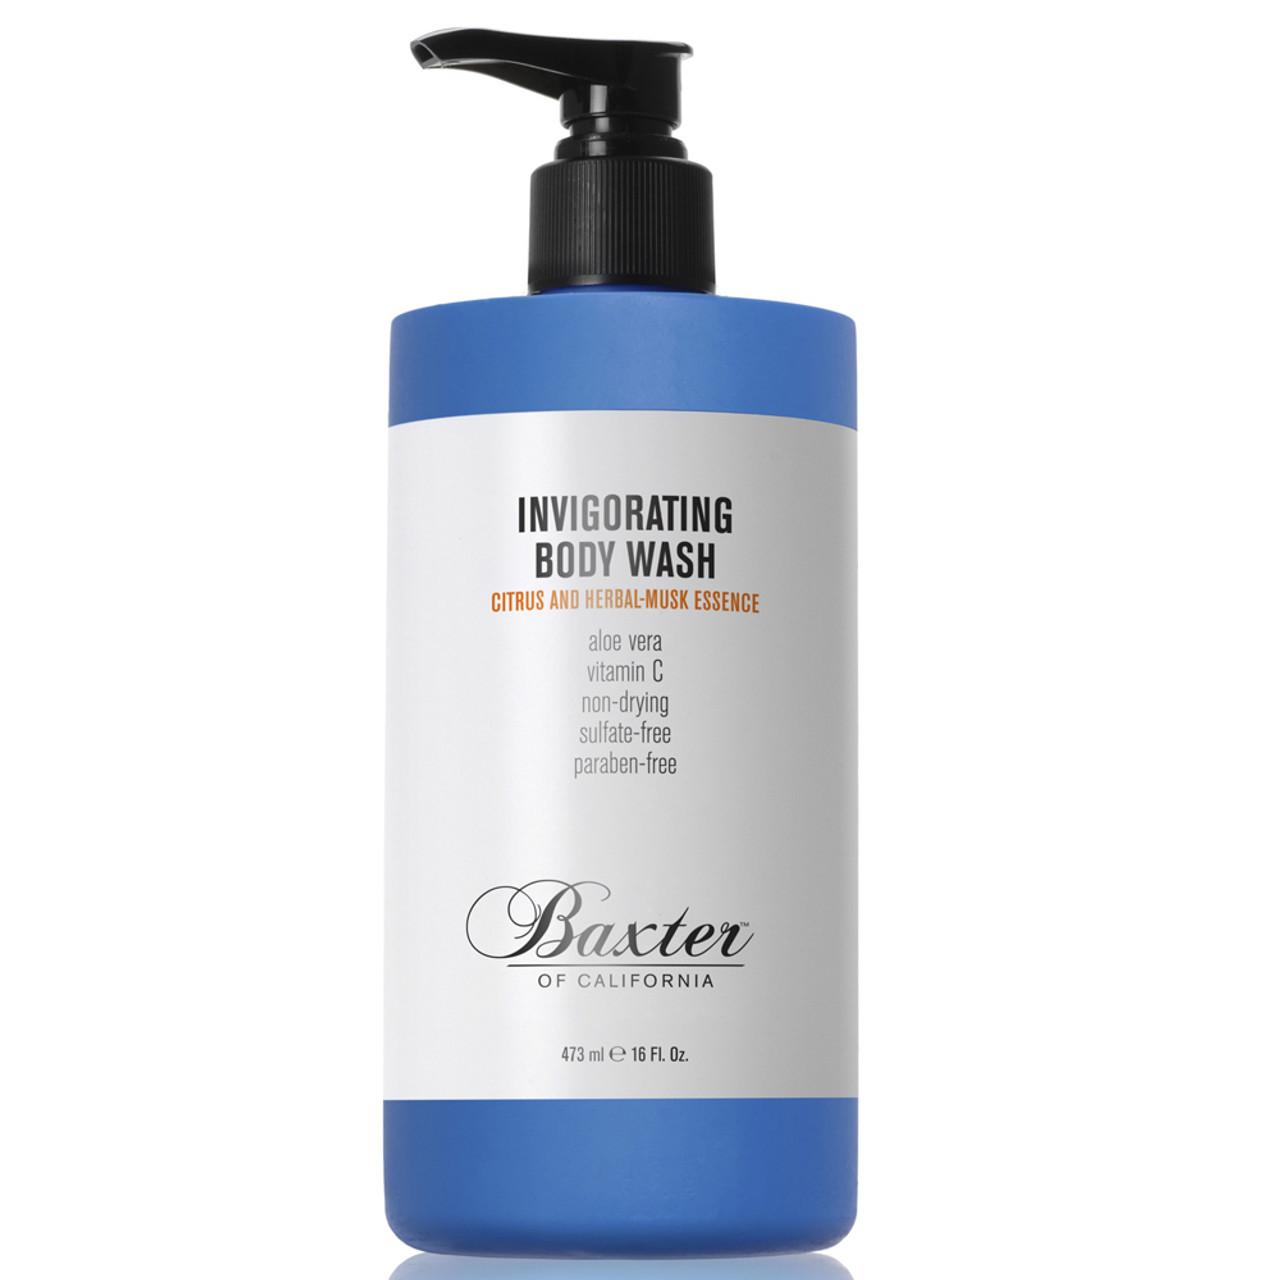 Baxter of California Invigorating Body Wash Citrus & Herbal Musk 8 oz